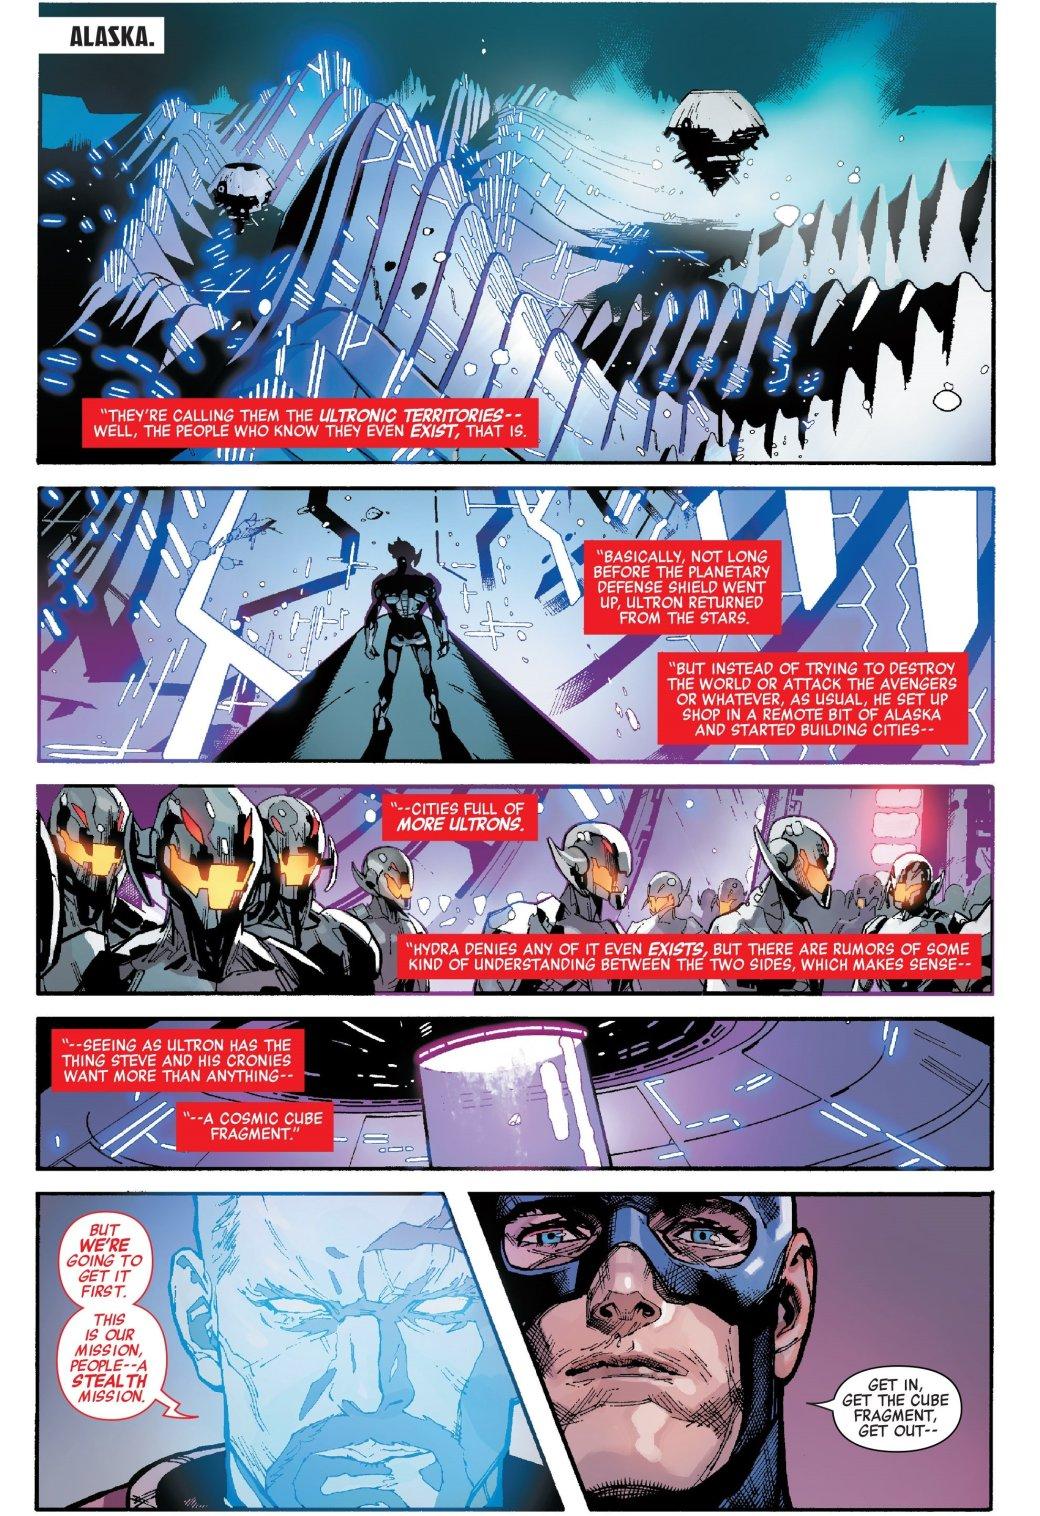 Secret Empire: противостоянию Стива Роджерса иТони Старка нет конца - Изображение 16